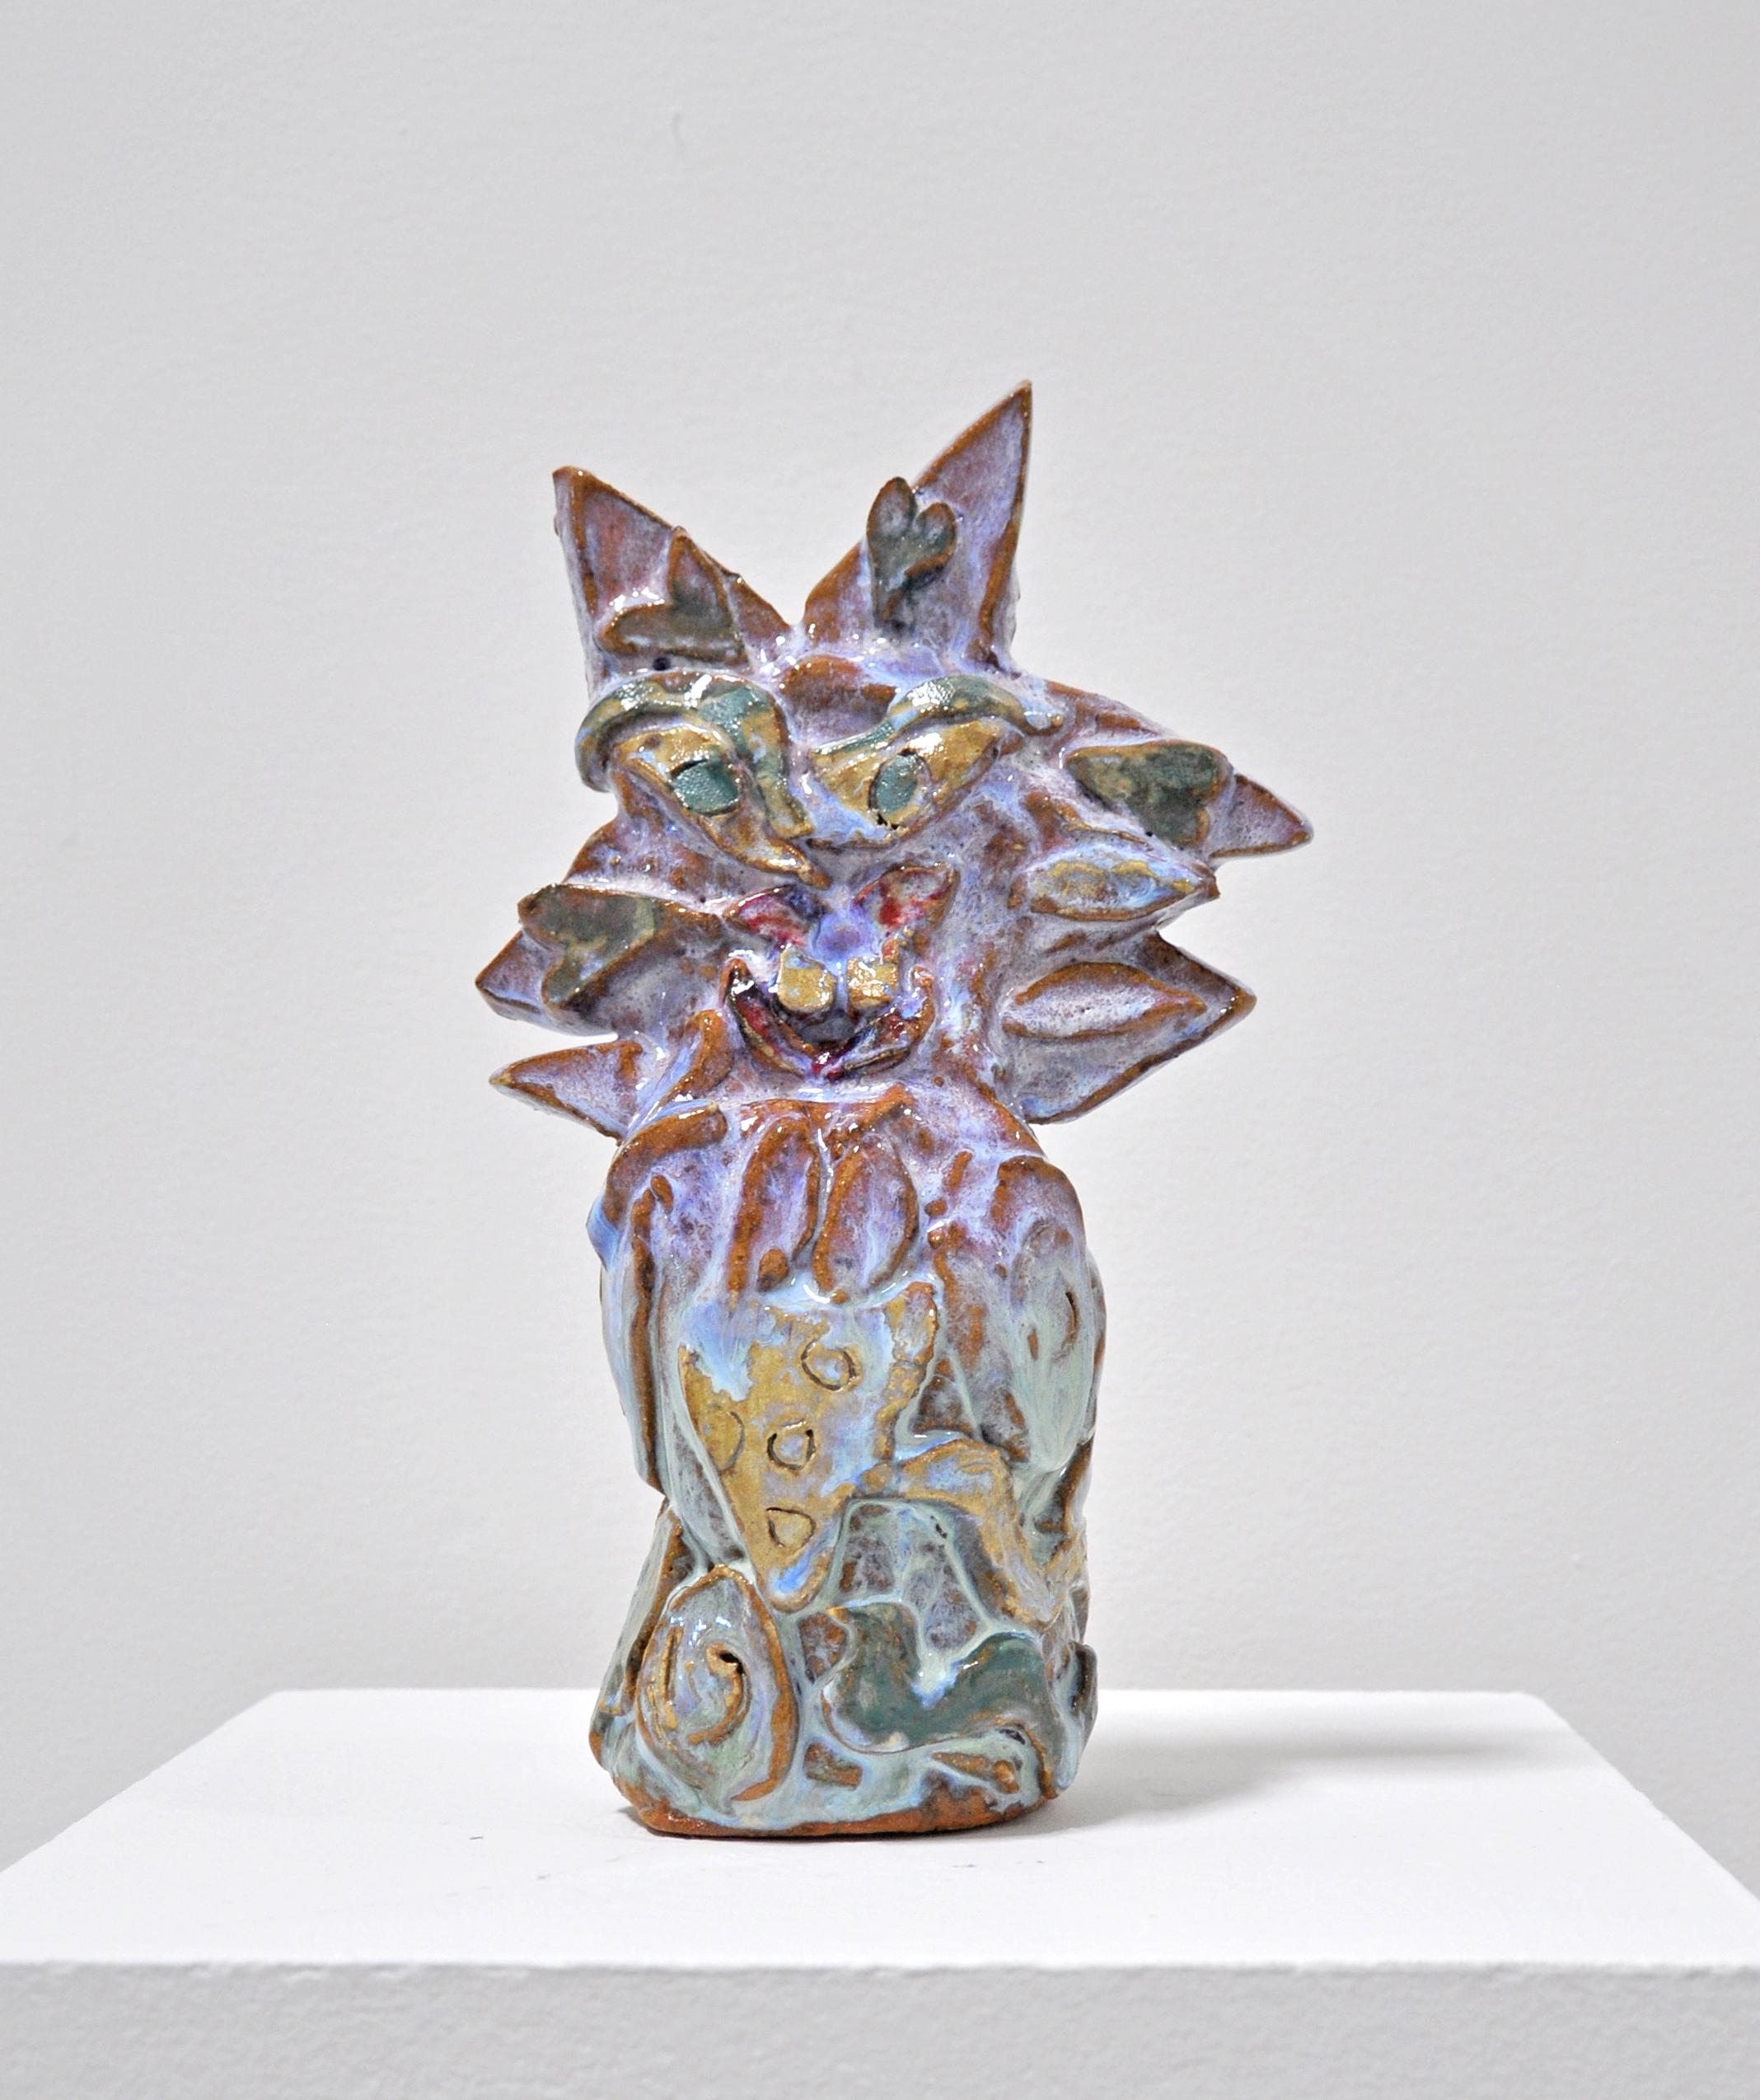 Copy of Jamie Felton NEGLECTED SUNFLOWER, 12 x 4 x 4in, Glazed ceramic, 2019